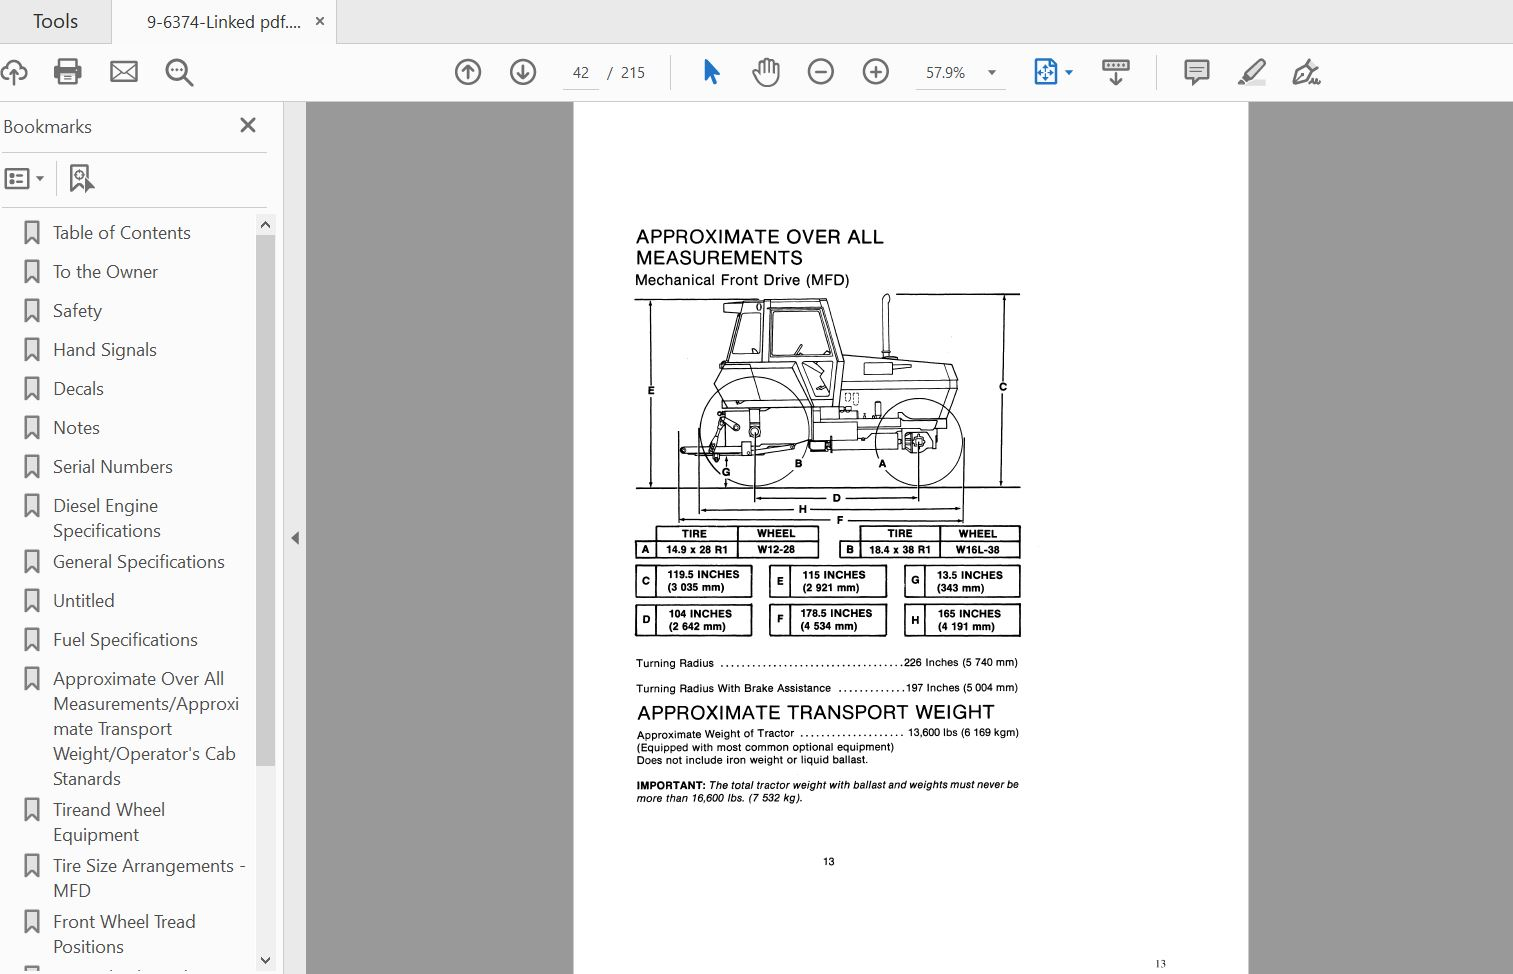 Case Ih Tractor 2090 Operator U0026 39 S Manual 9